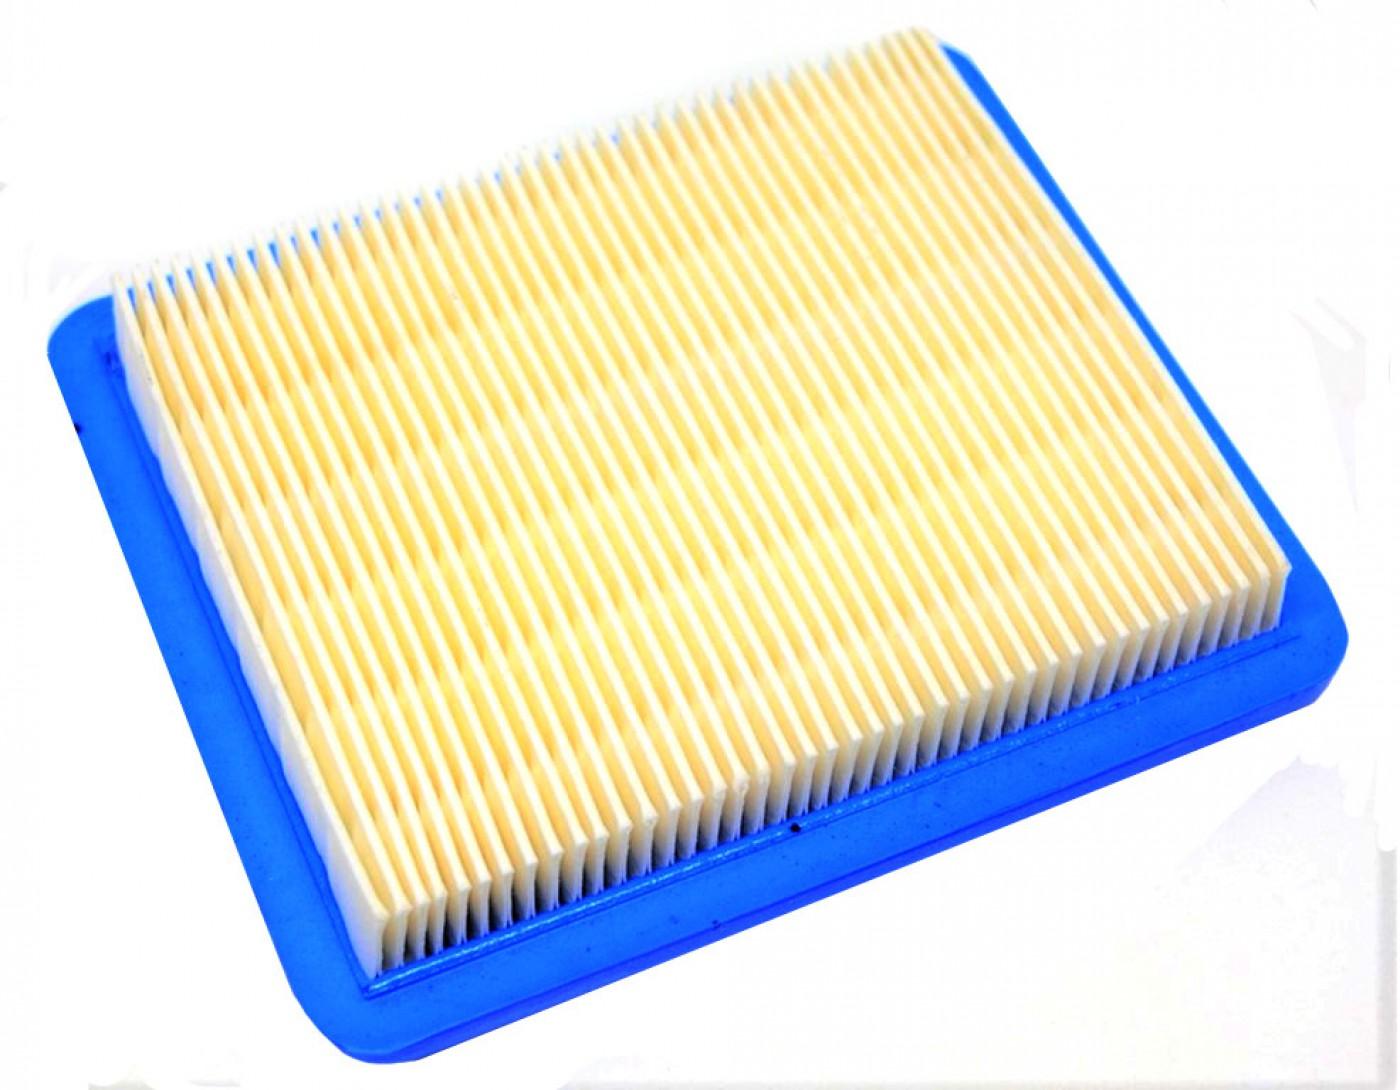 Vzduchový filter B&S Briggs & Stratton